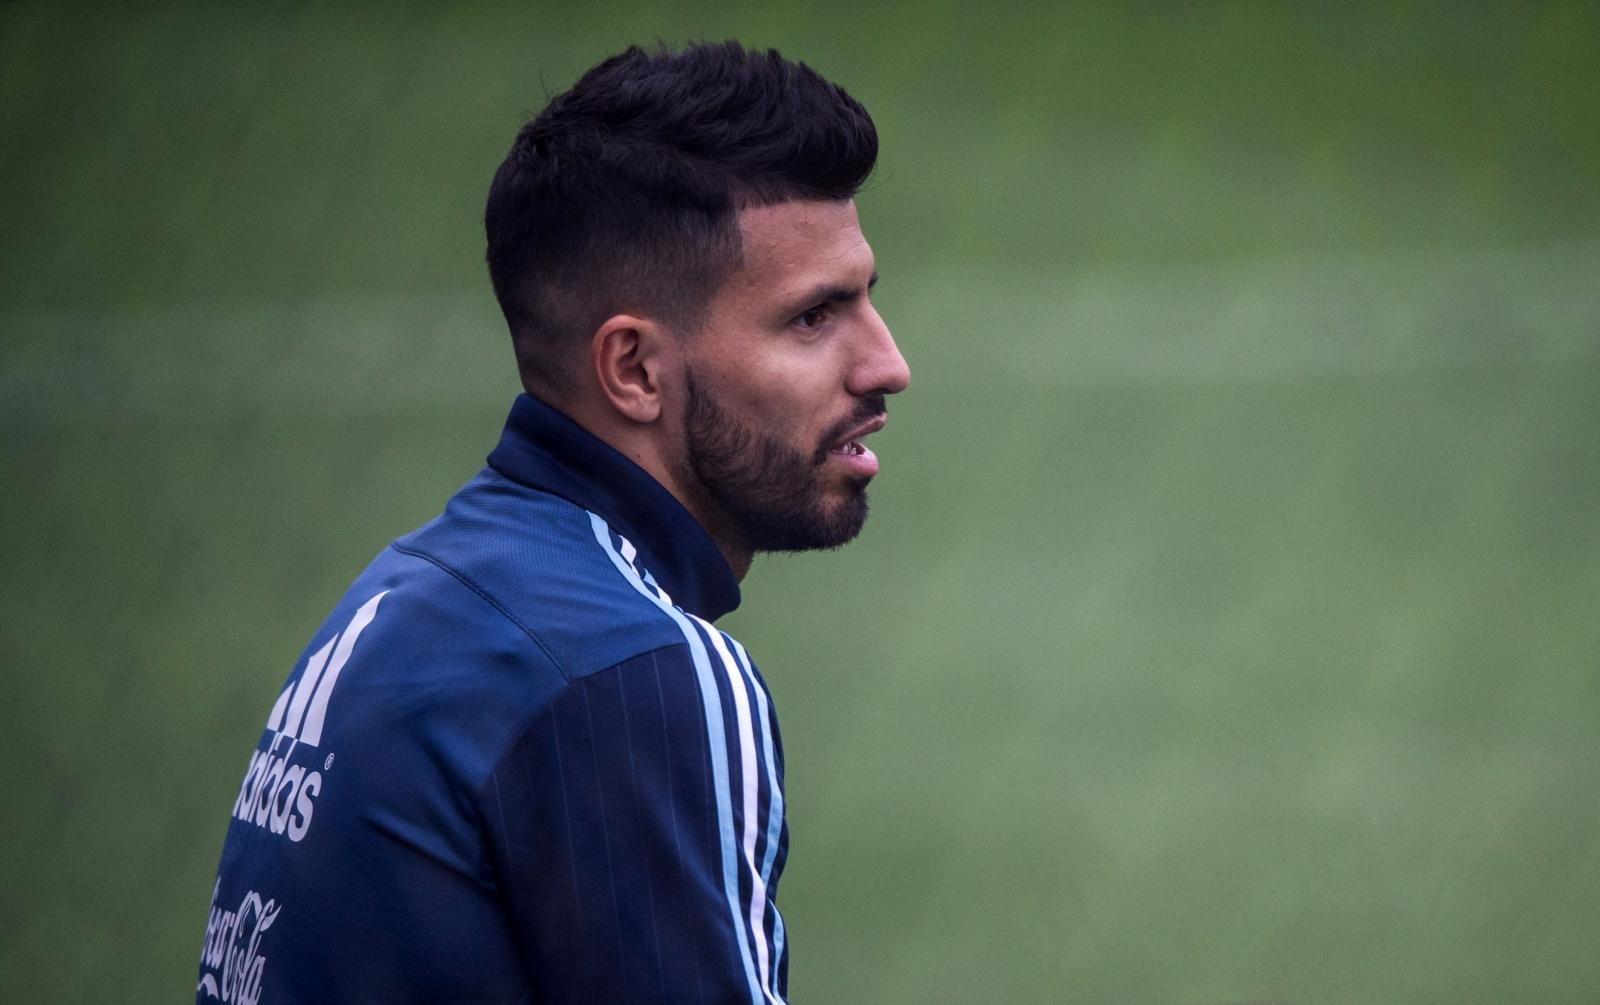 Sergio Aguero calf injury Manchester City star allays fears over